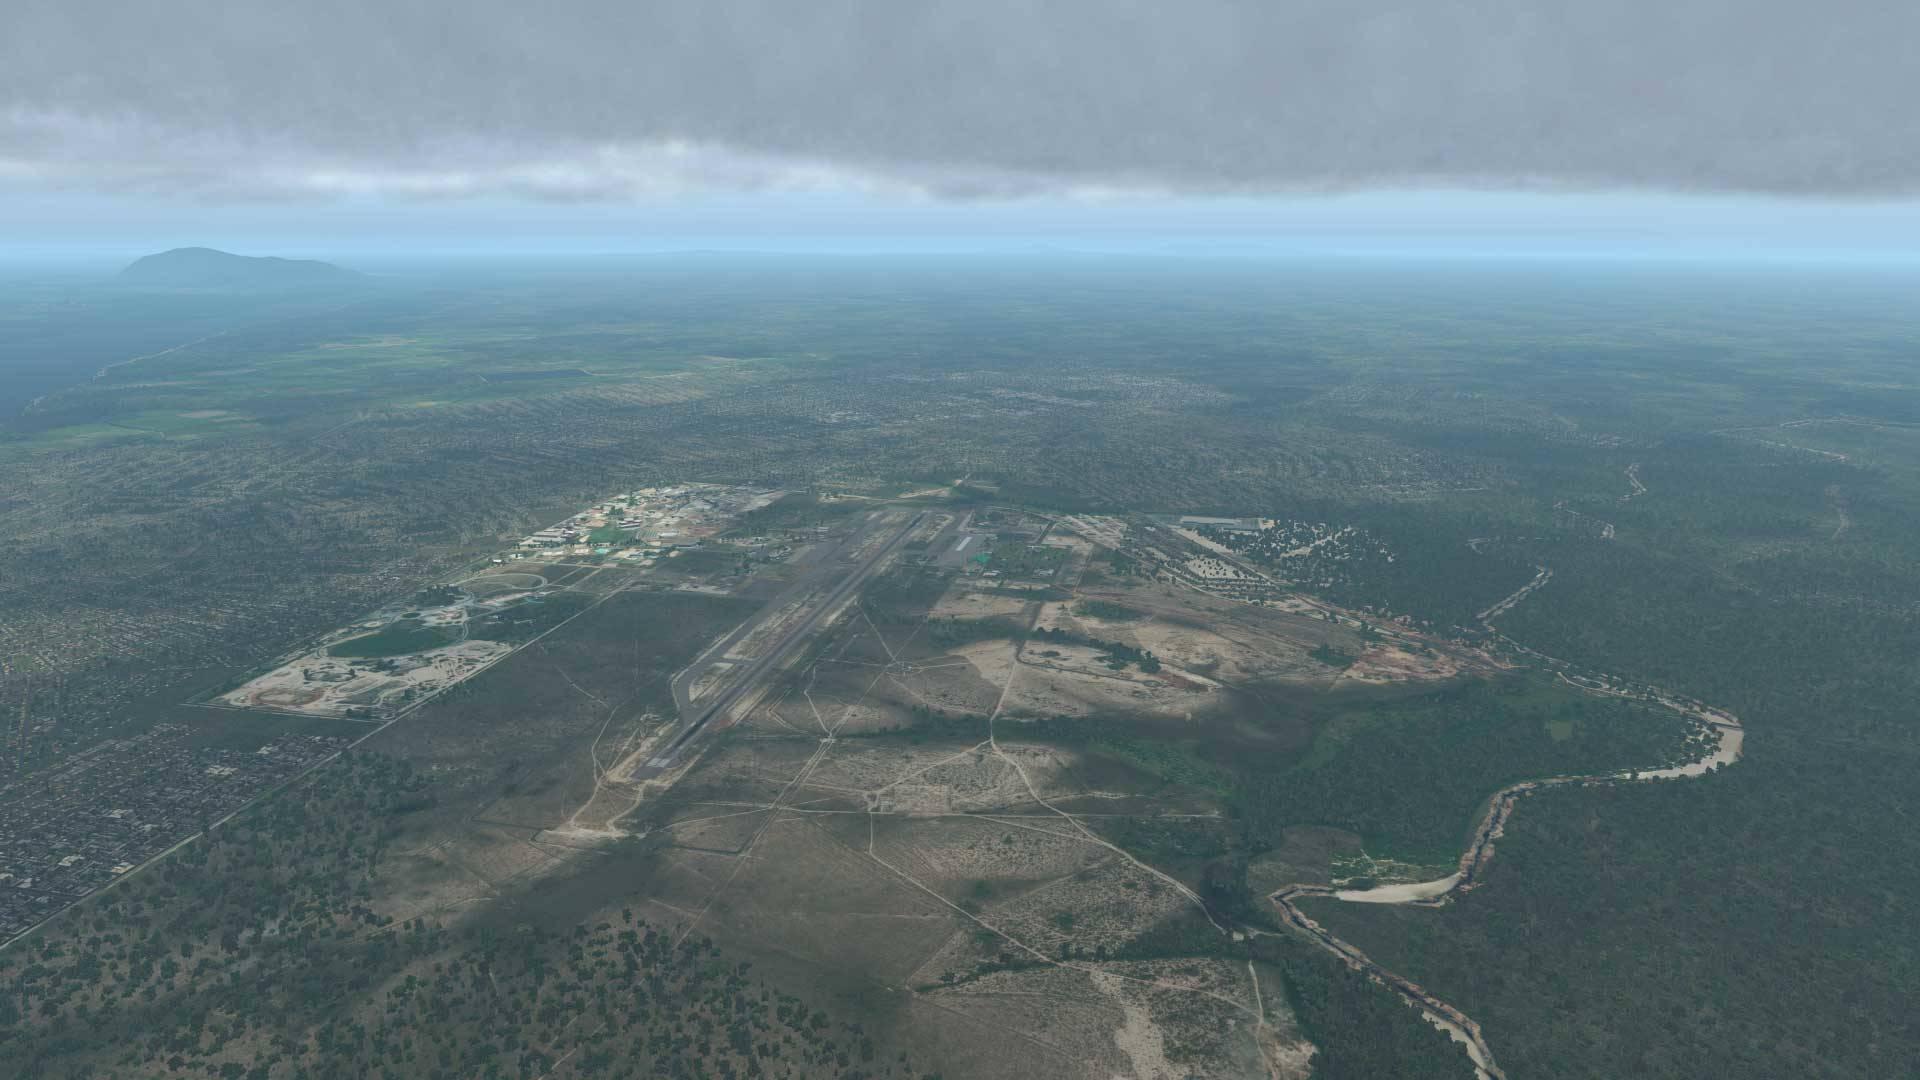 Grand Amazonia Scenery - Just Flight